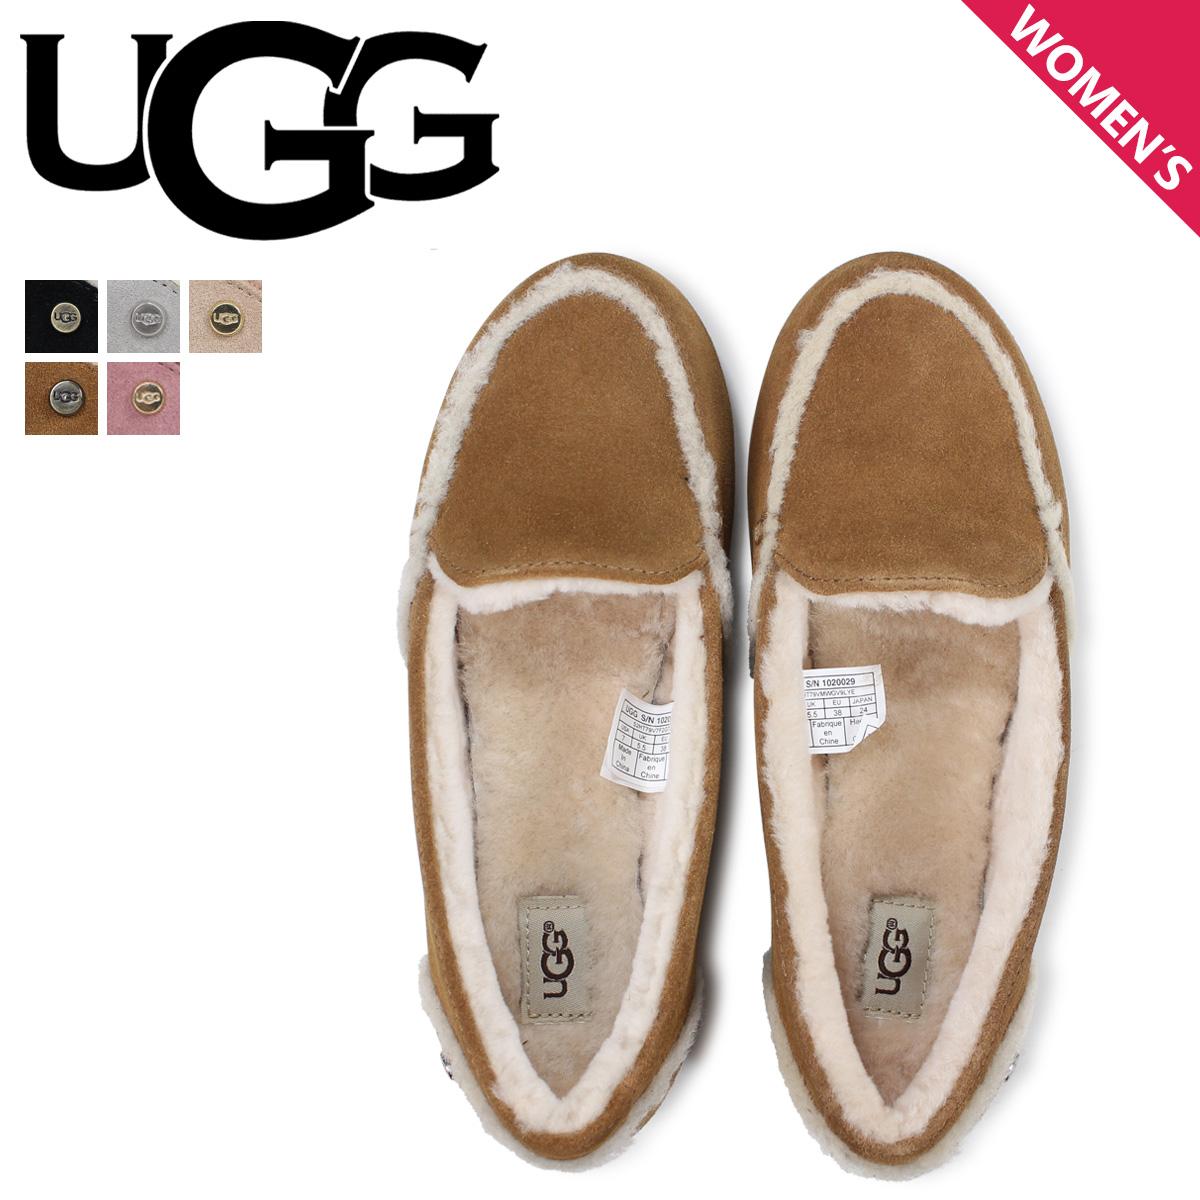 UGG アグ スリッポン ヘイリー レディース ムートン シープスキン WOMENS HAILEY ブラック グレー ブラウン ピンク 1020029